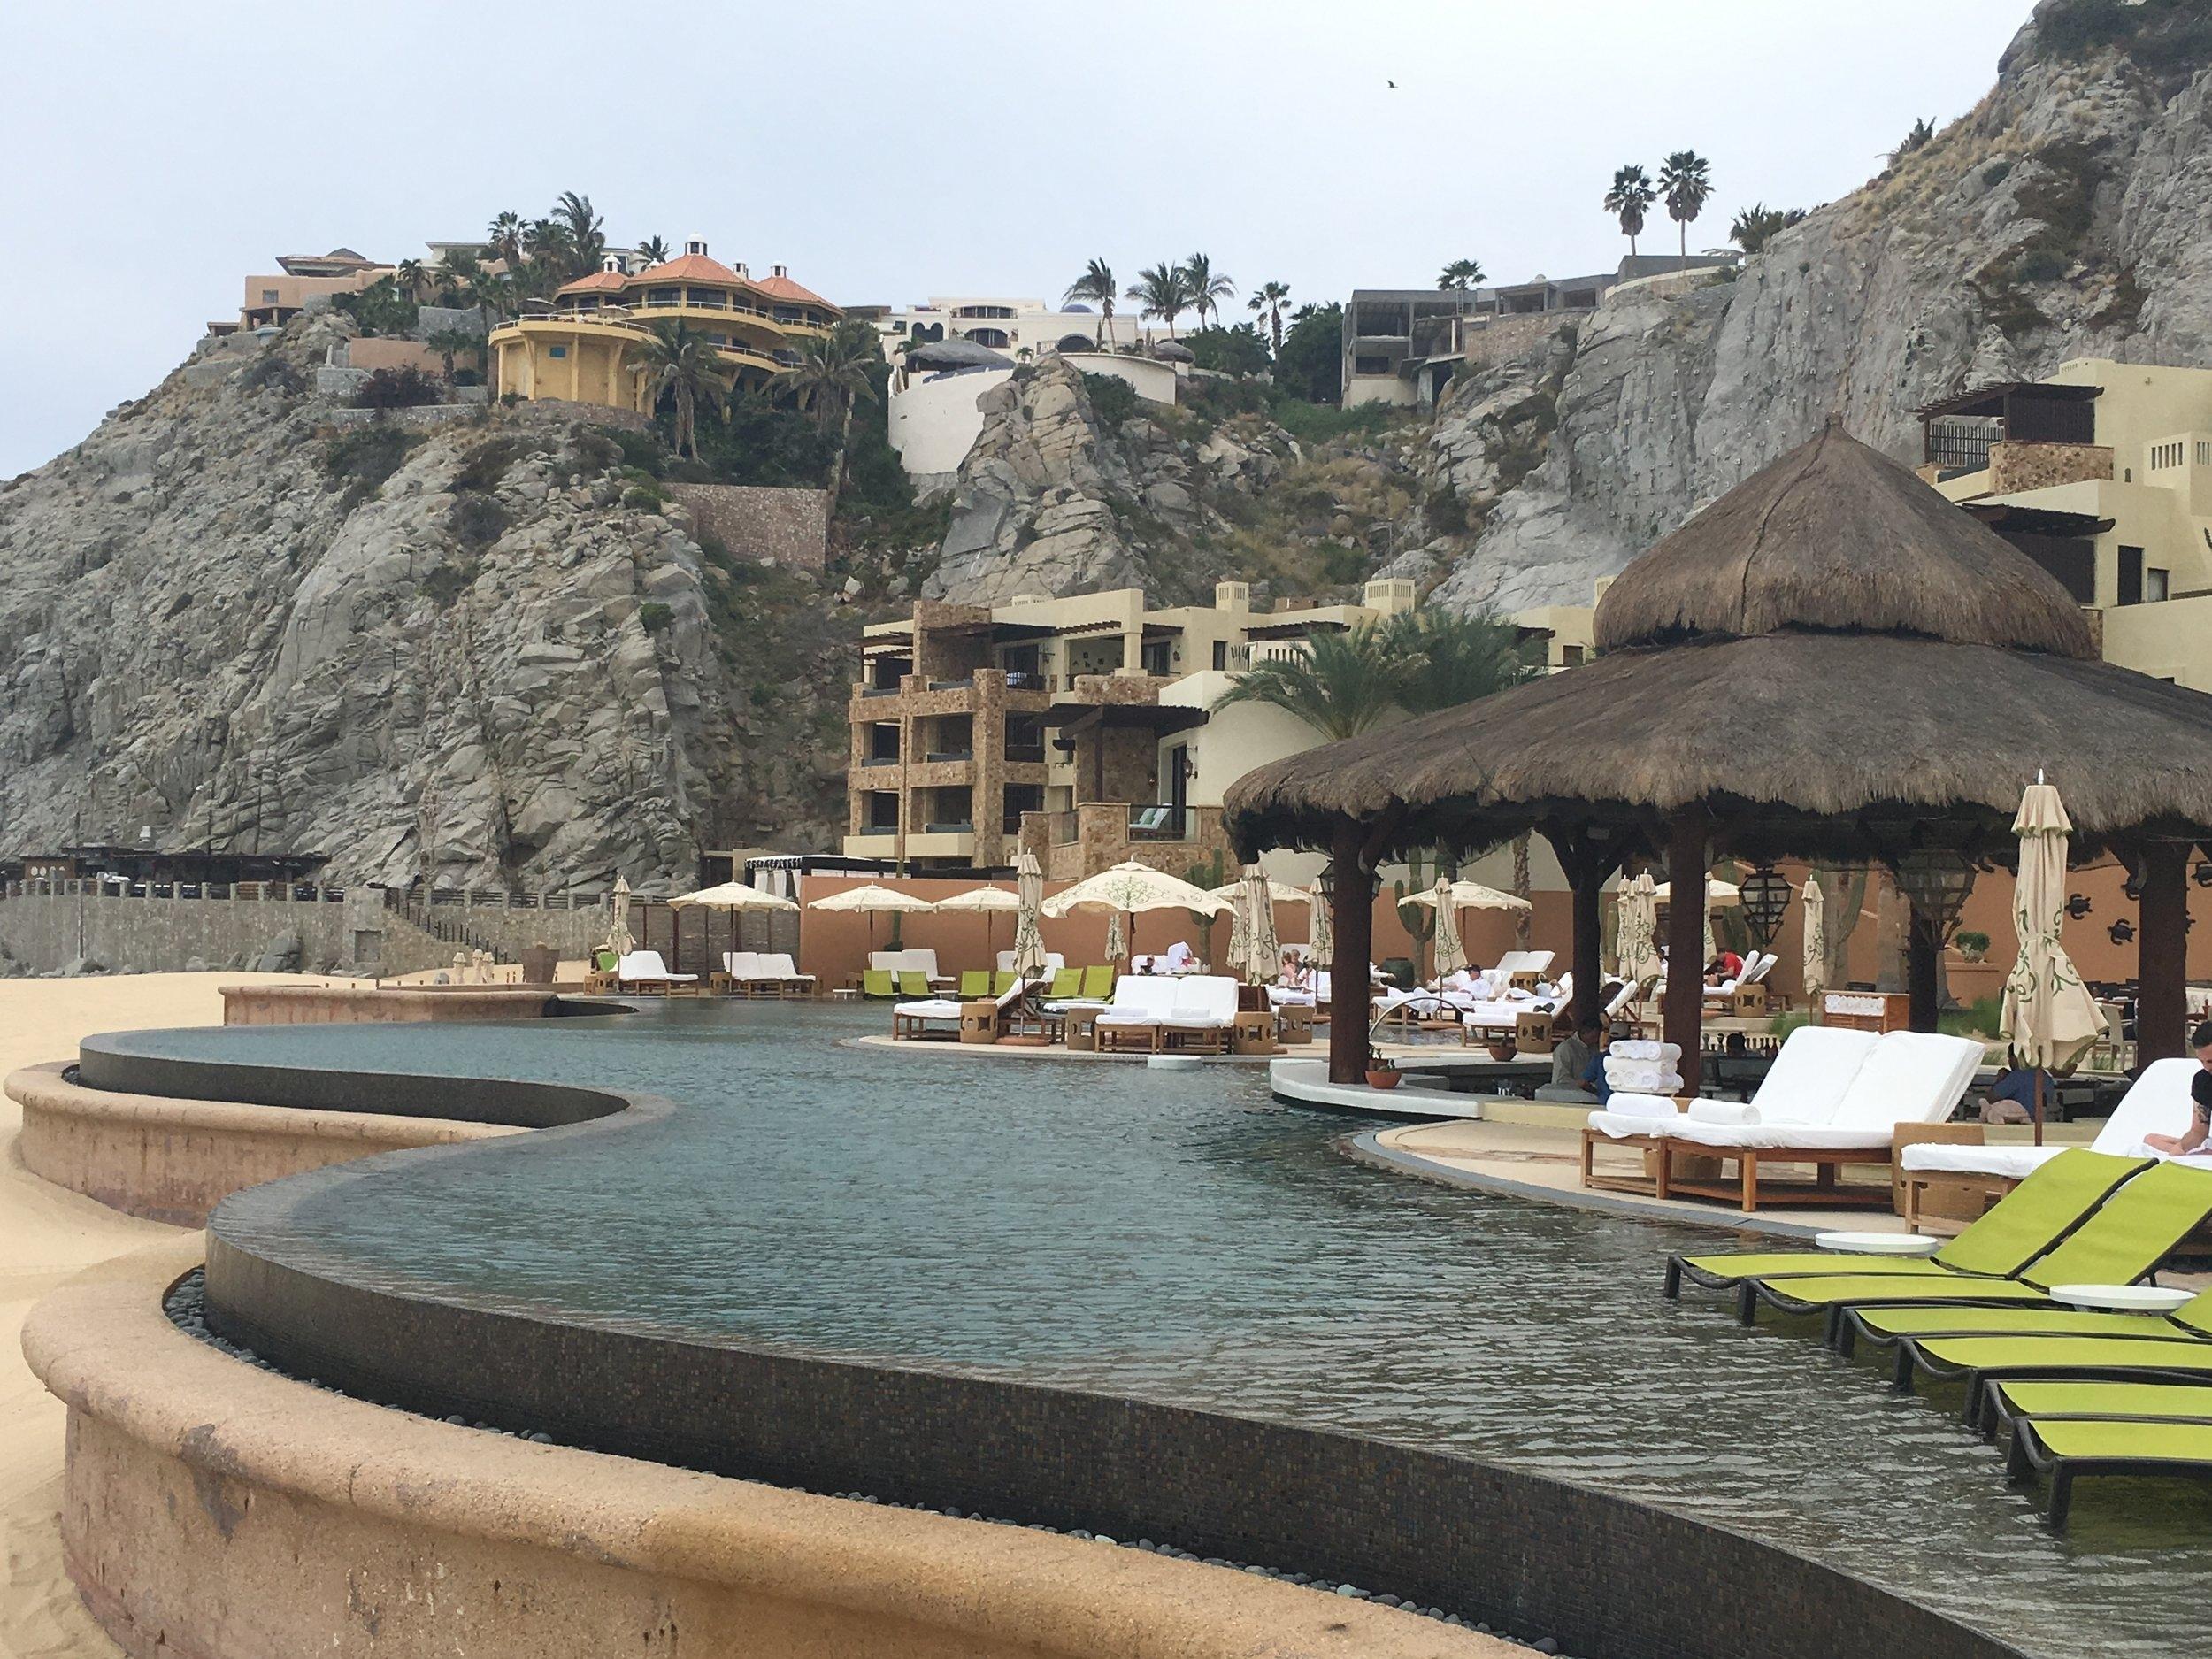 Wanderlust-blog-Resort-at-Pedregal-luxury-resort-Mexico-Los-Cabos